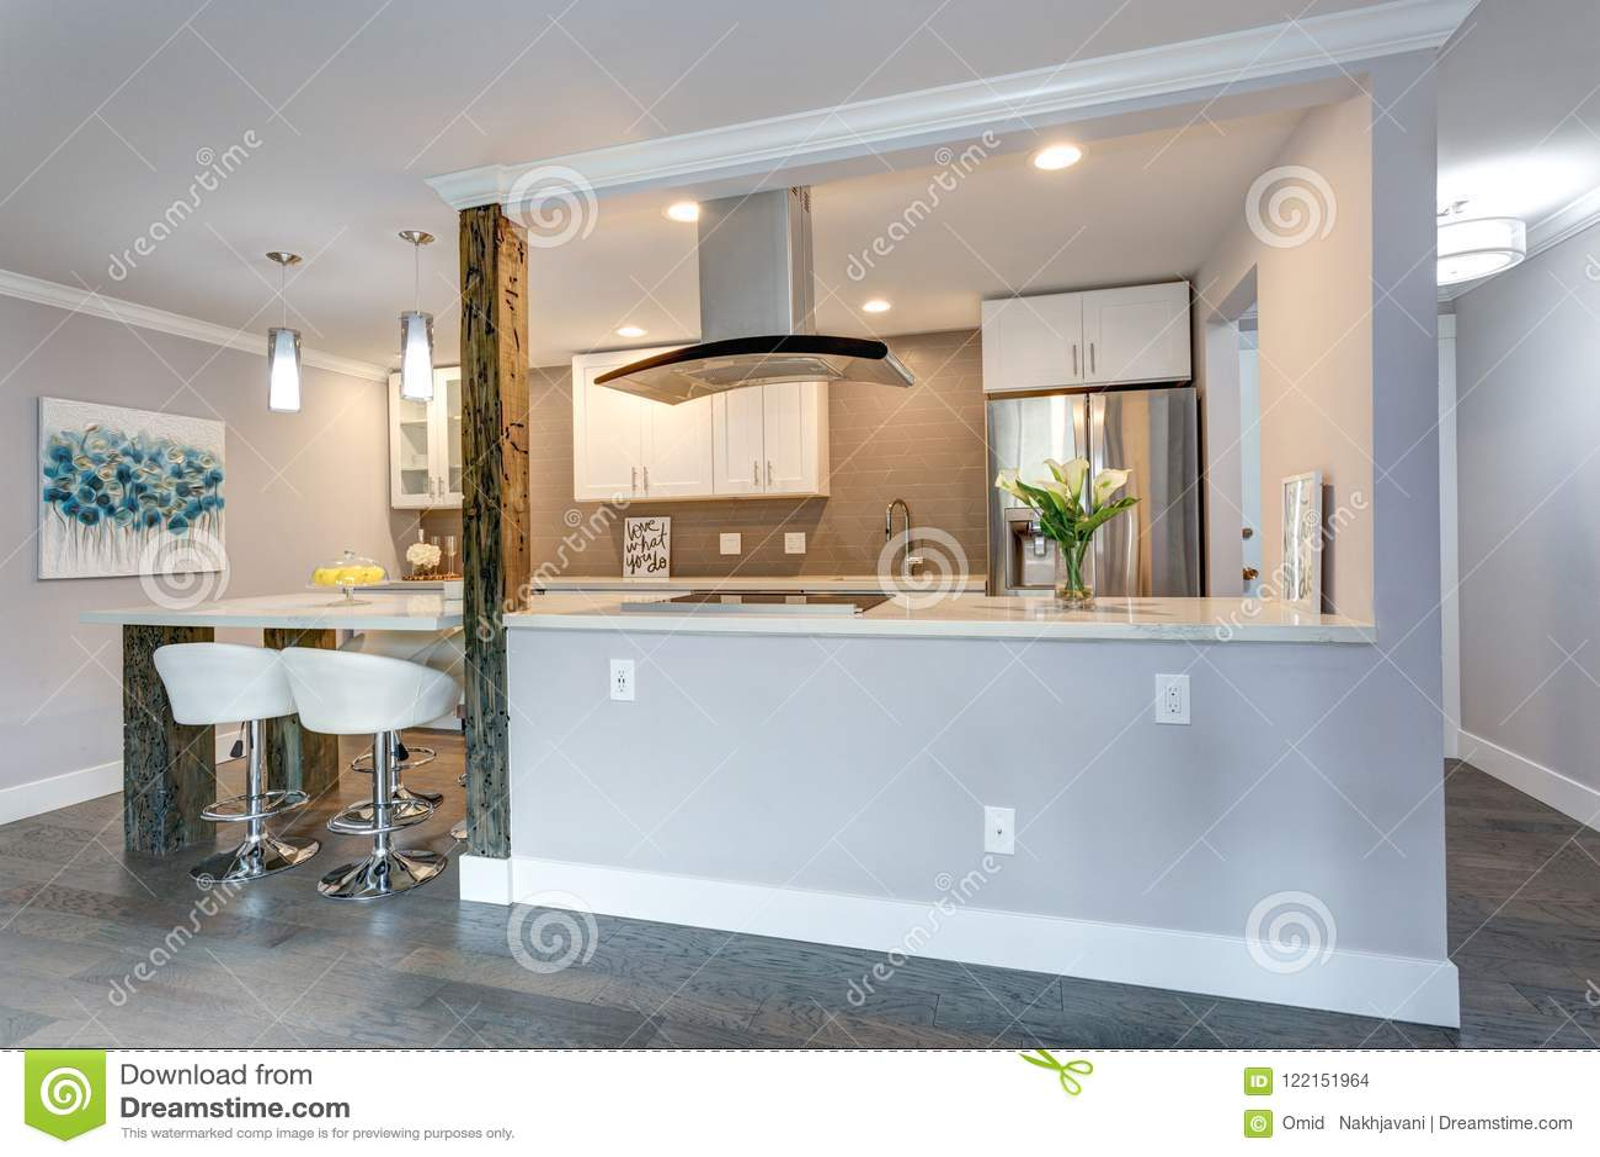 White Small Kitchen In Modern Apartment Stock Photo Image Of Condo Interior 122151964